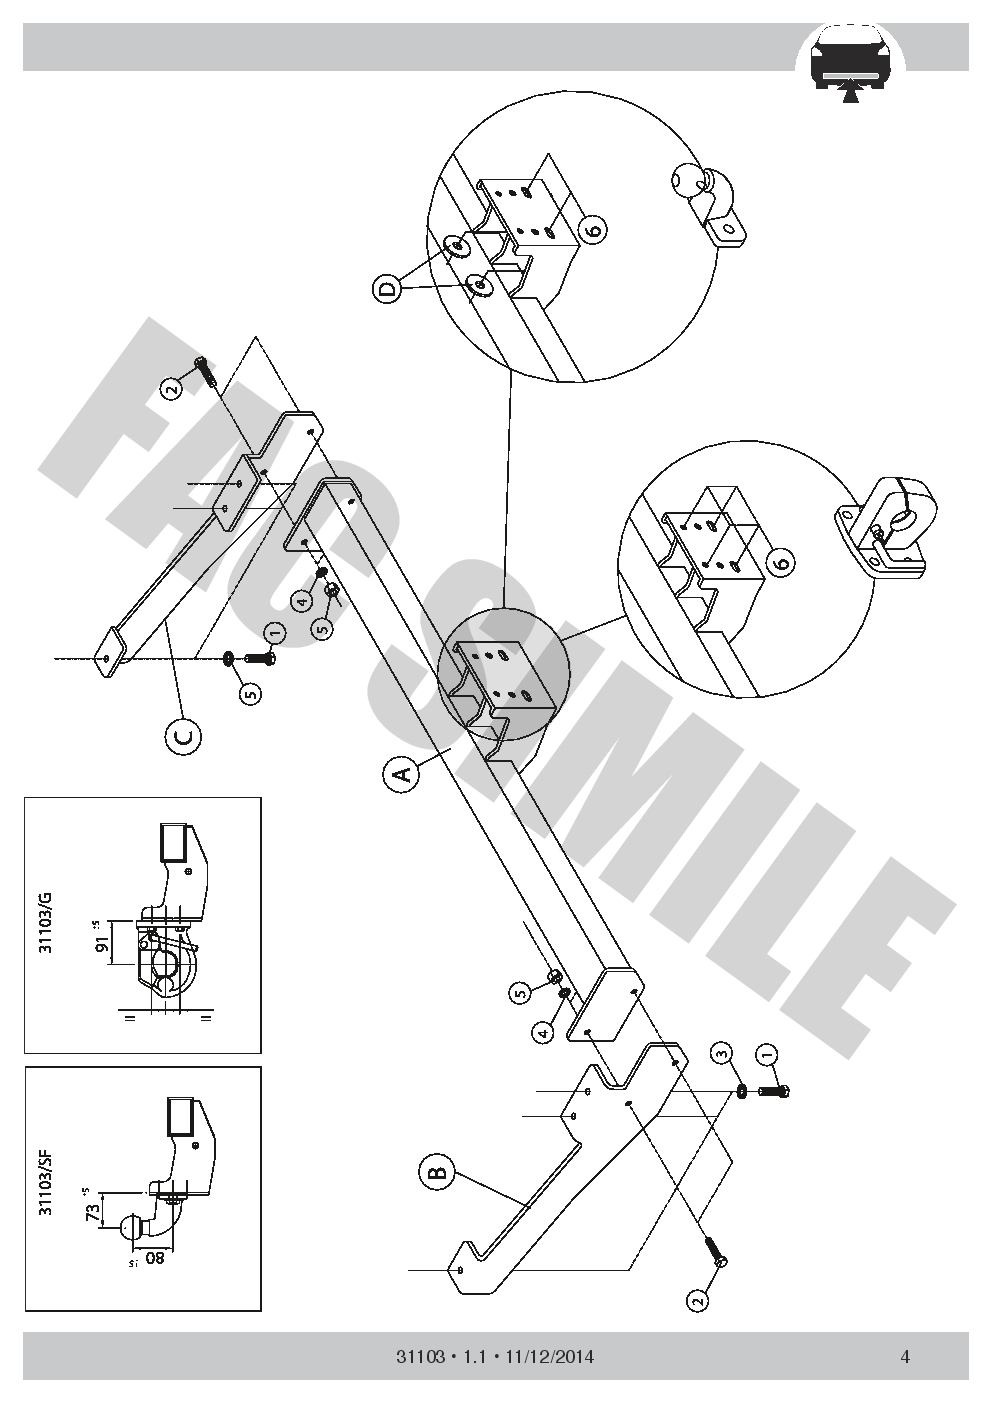 AHK Flansch Anhängerkupplung 7p C2 E-Satz Opel Vaux Vivaro Van 2014 31103/_B1